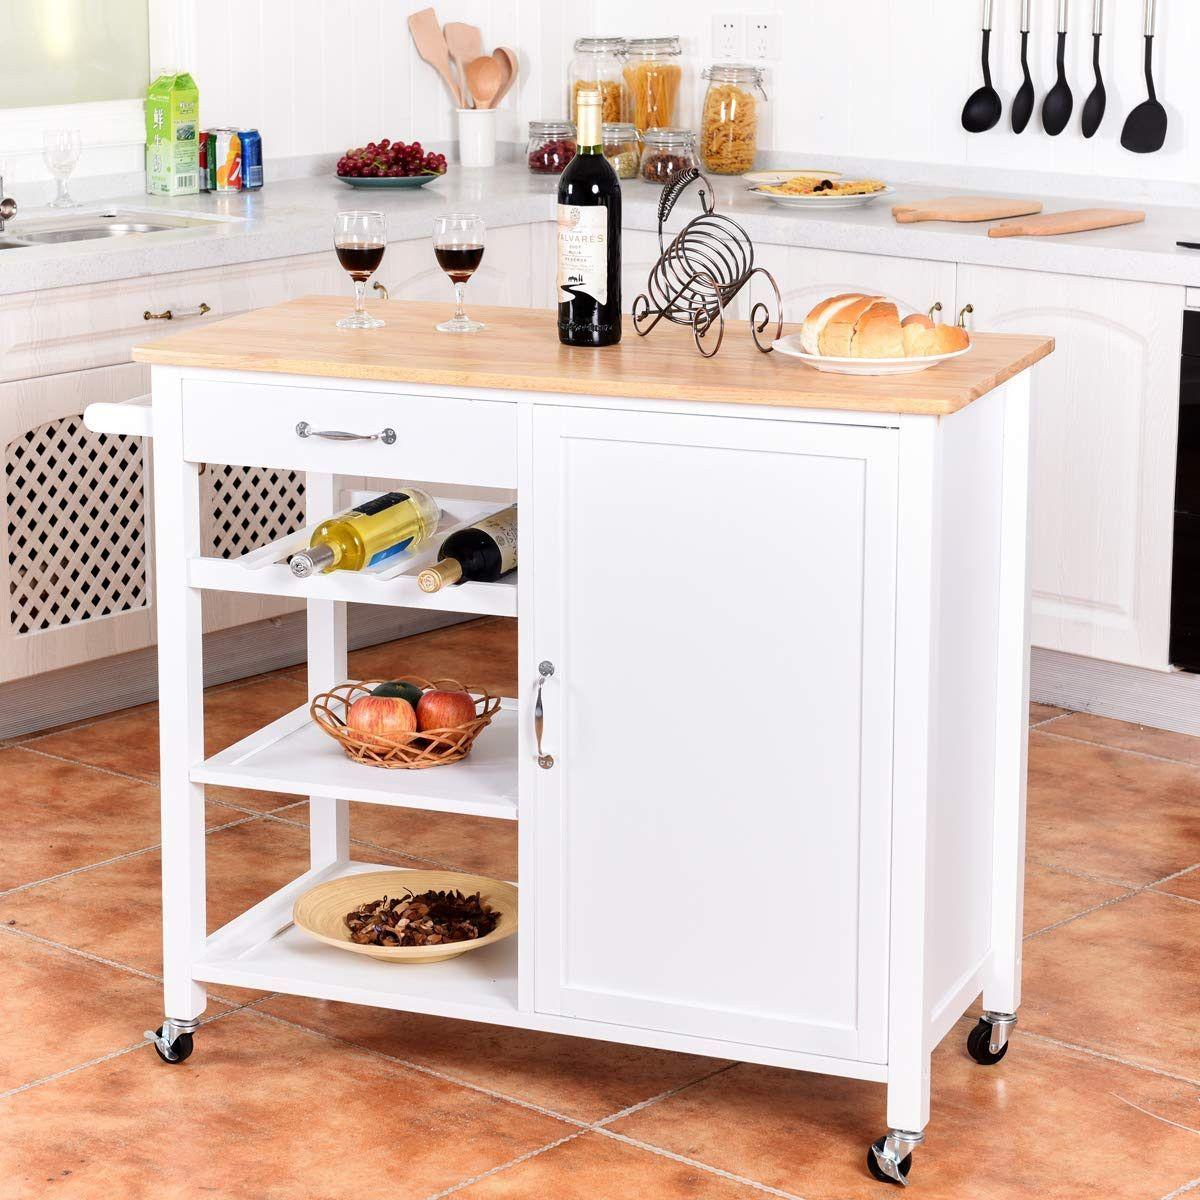 Giantex Kitchen Trolley Cart W Wheels Rolling Storage Cabinet Kitchen Trolley Cart Kitchen Wood Kitchen